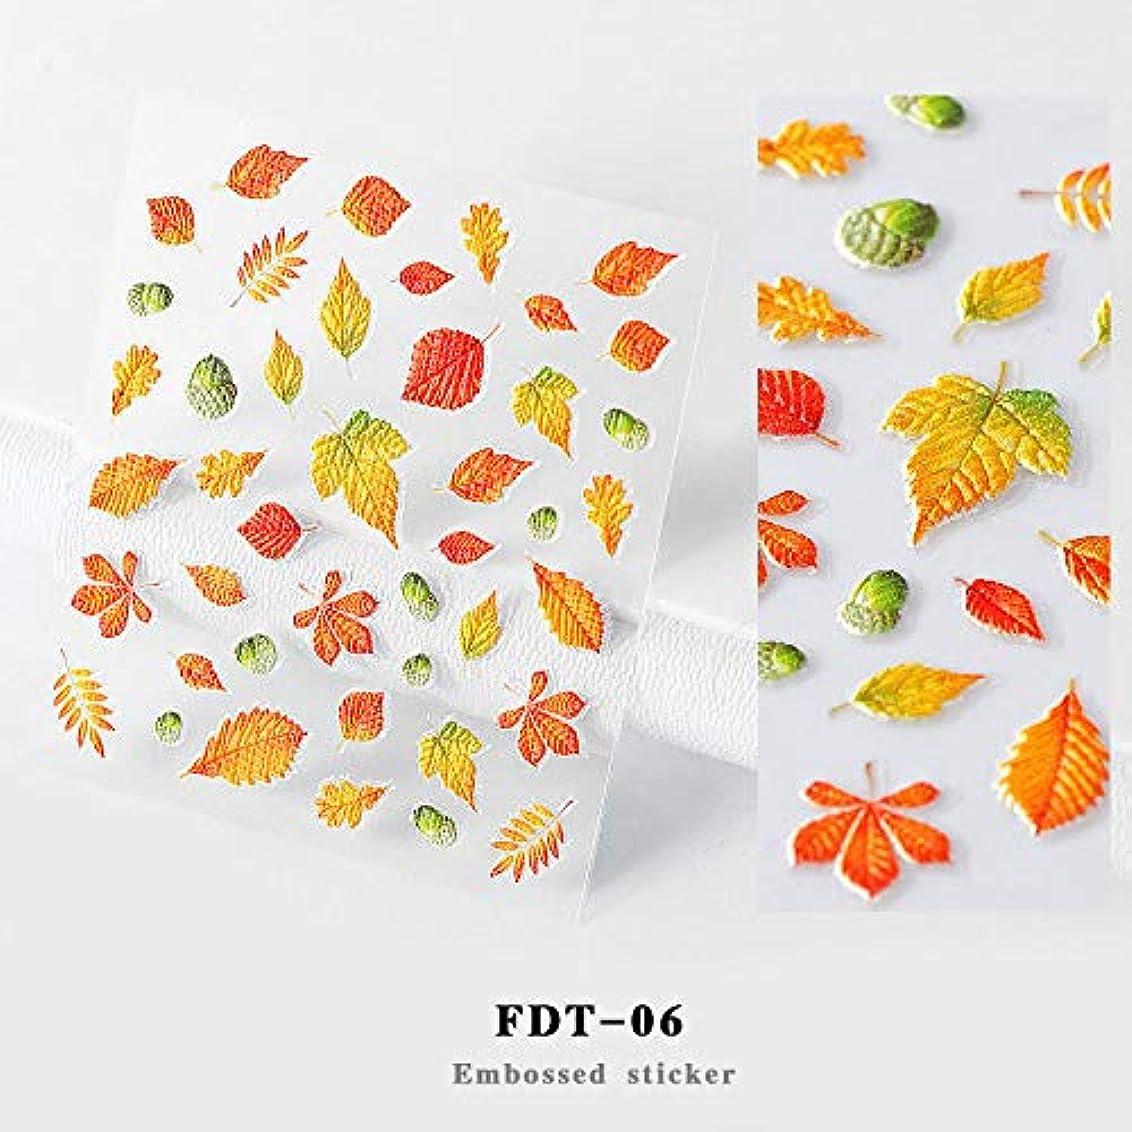 Murakush ネイルステッカー 5D アクリル 刻まれる 花の接着剤 DIYネイル エンボス花 デカール ネイル用装飾 可愛い ネイル飾り 通勤 通学 FDT-06